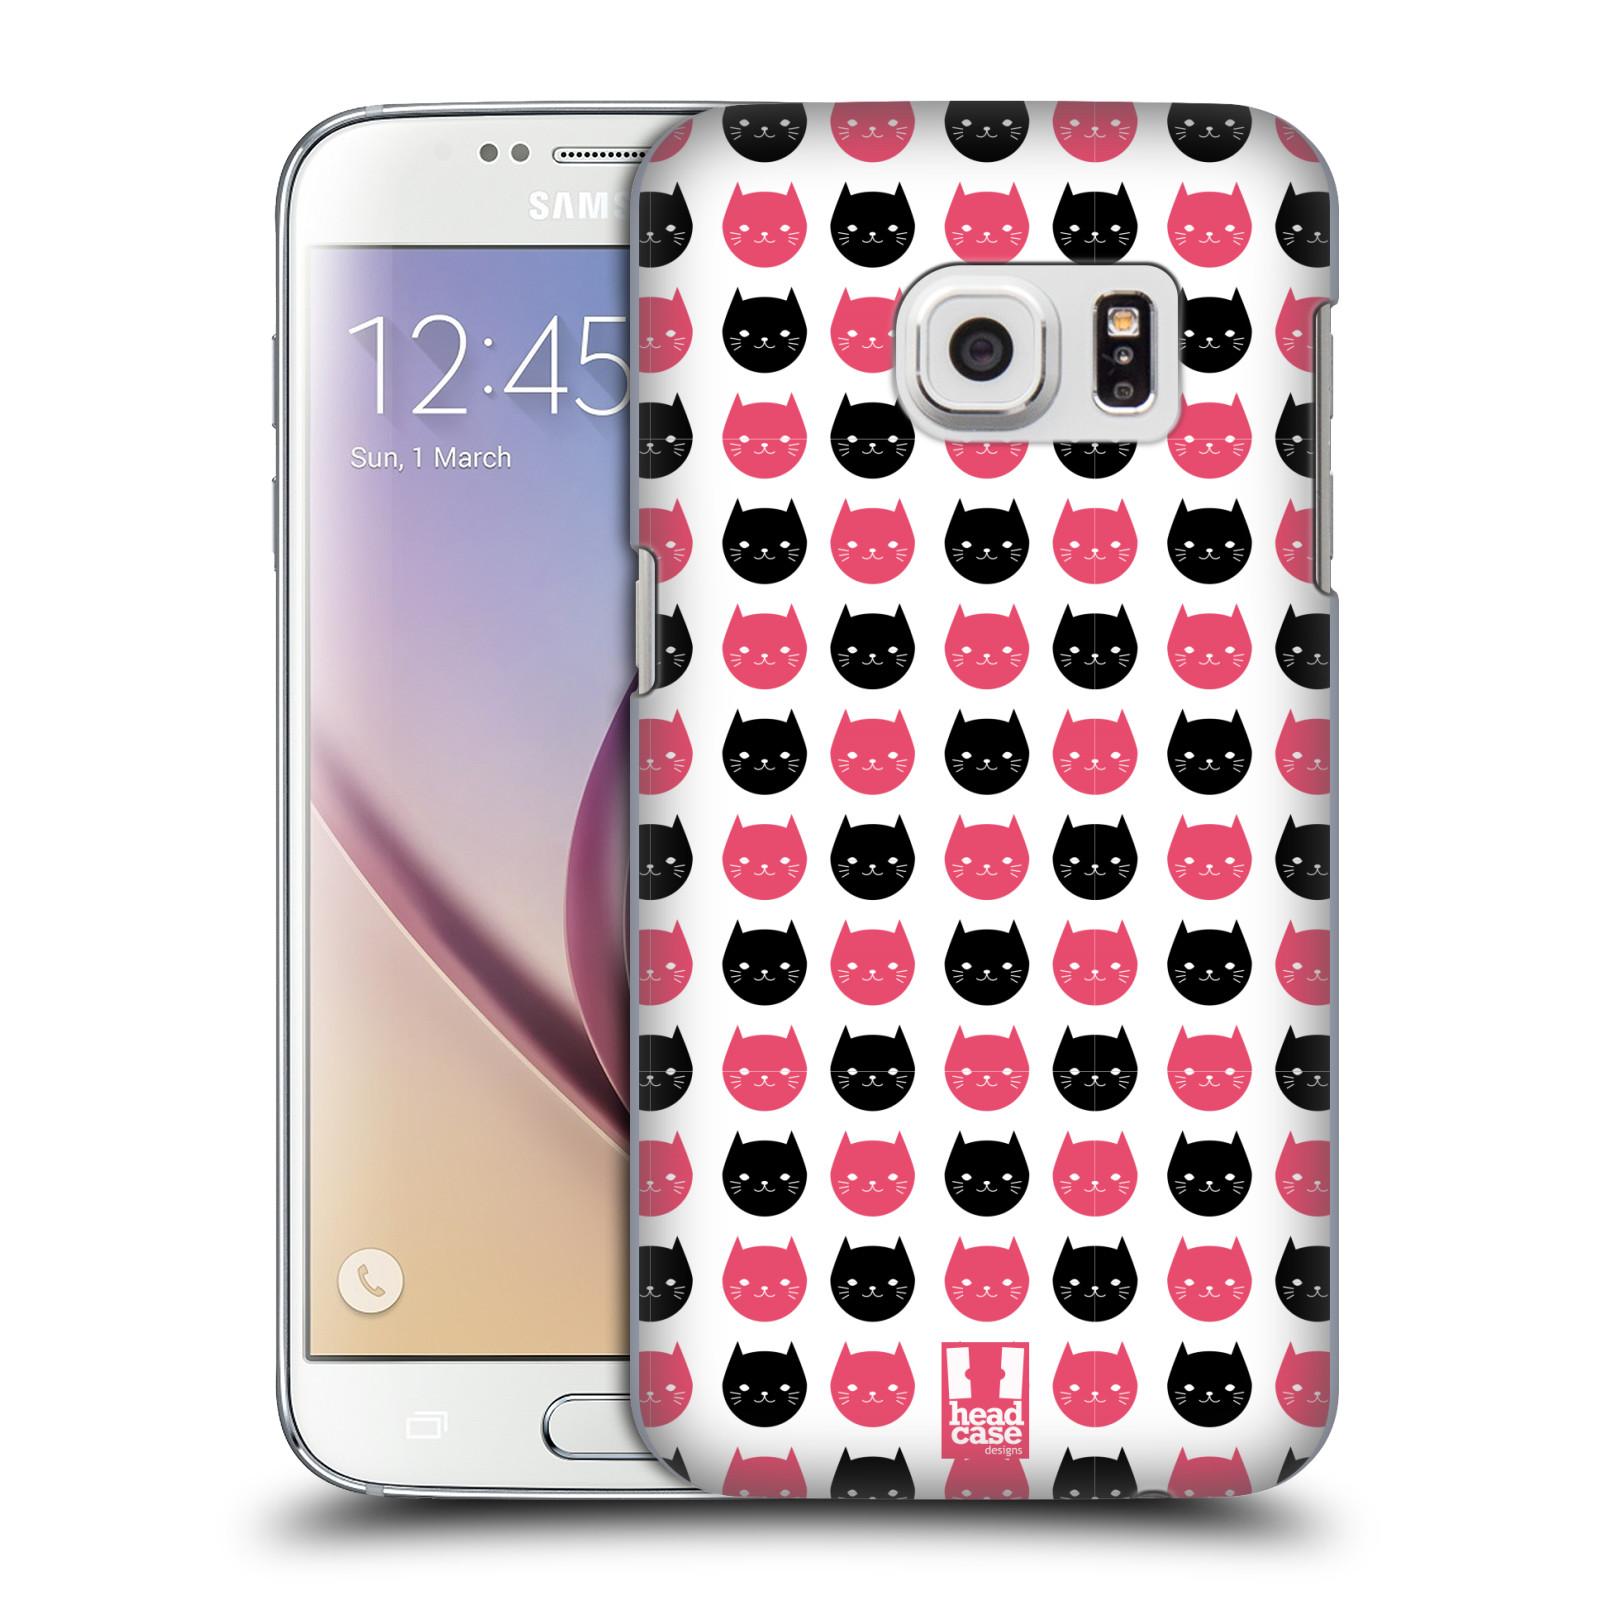 Plastové pouzdro na mobil Samsung Galaxy S7 HEAD CASE KOČKY Black and Pink (Kryt či obal na mobilní telefon Samsung Galaxy S7 SM-G930F)